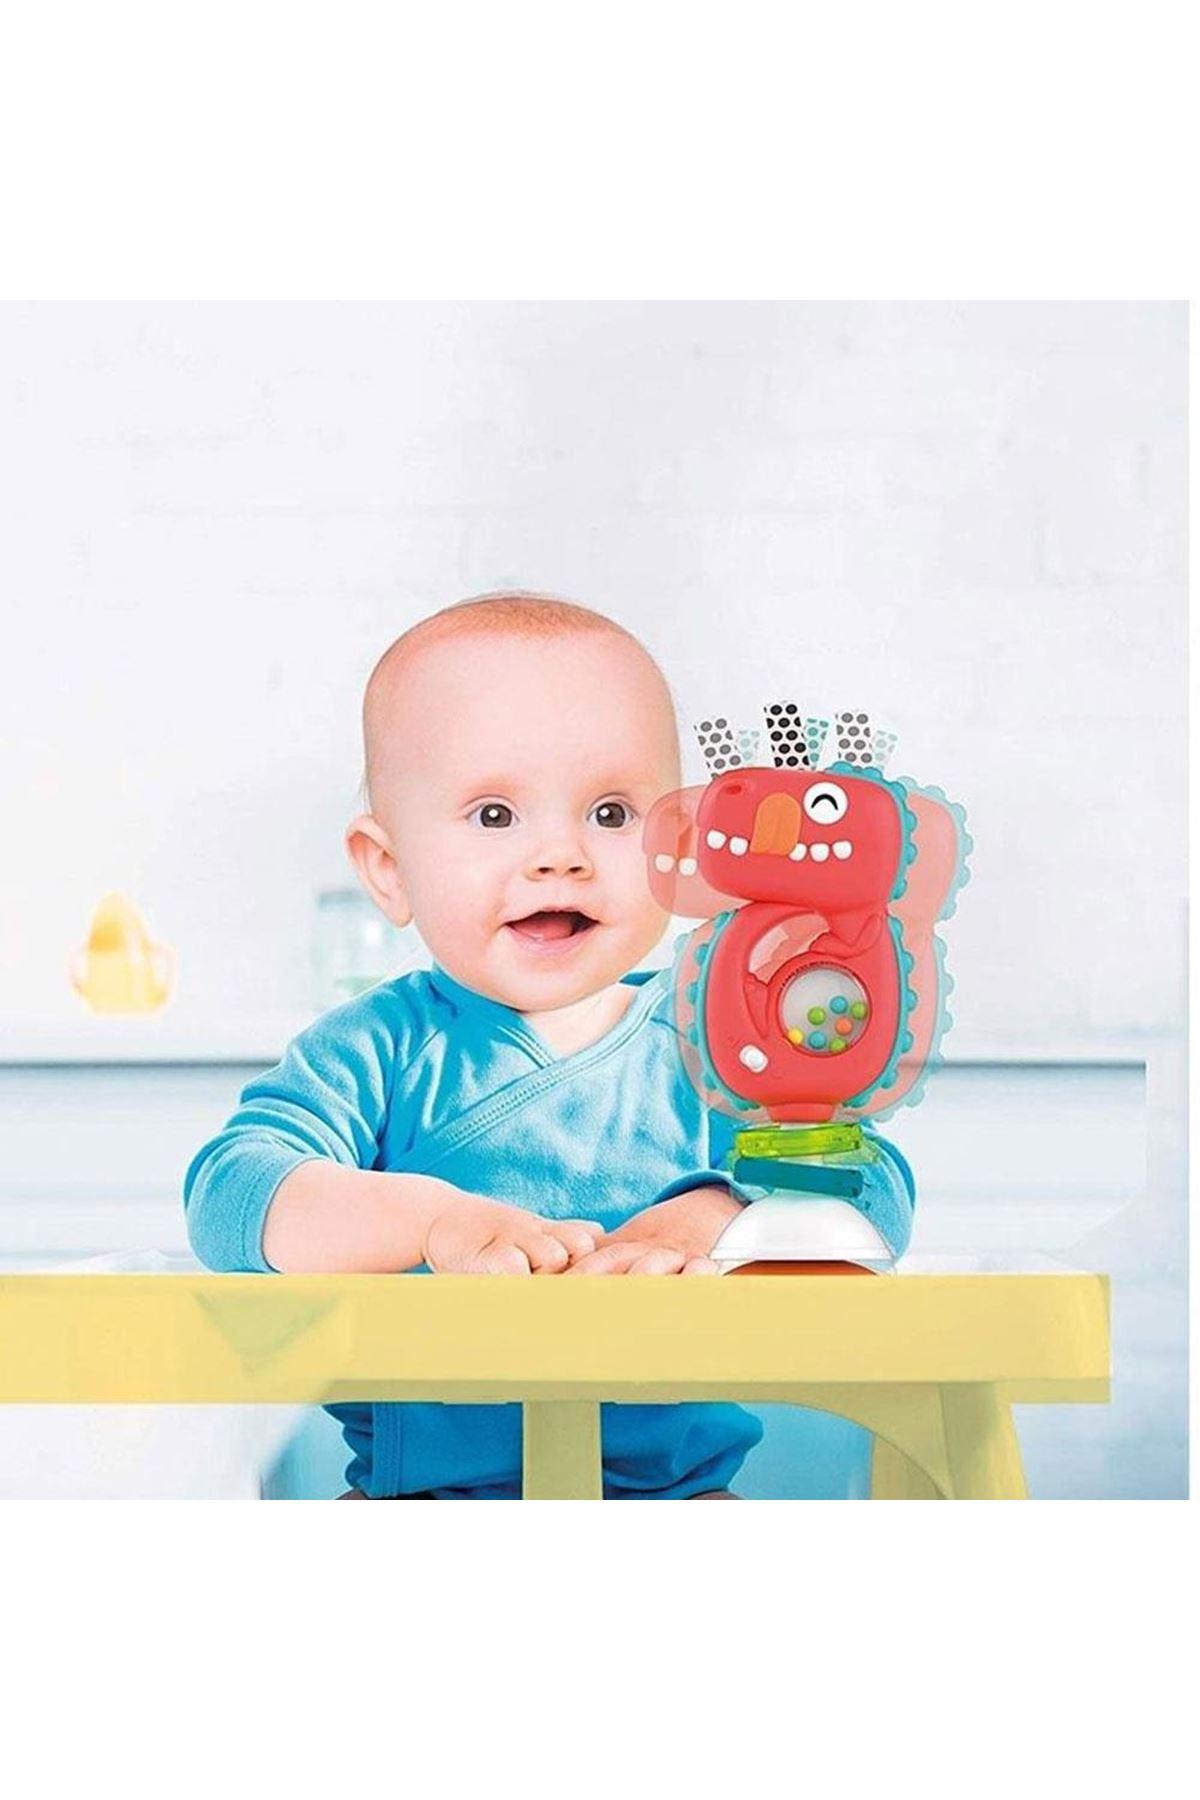 Clementoni Baby İnteraktif Dinozor Oyuncak 17330